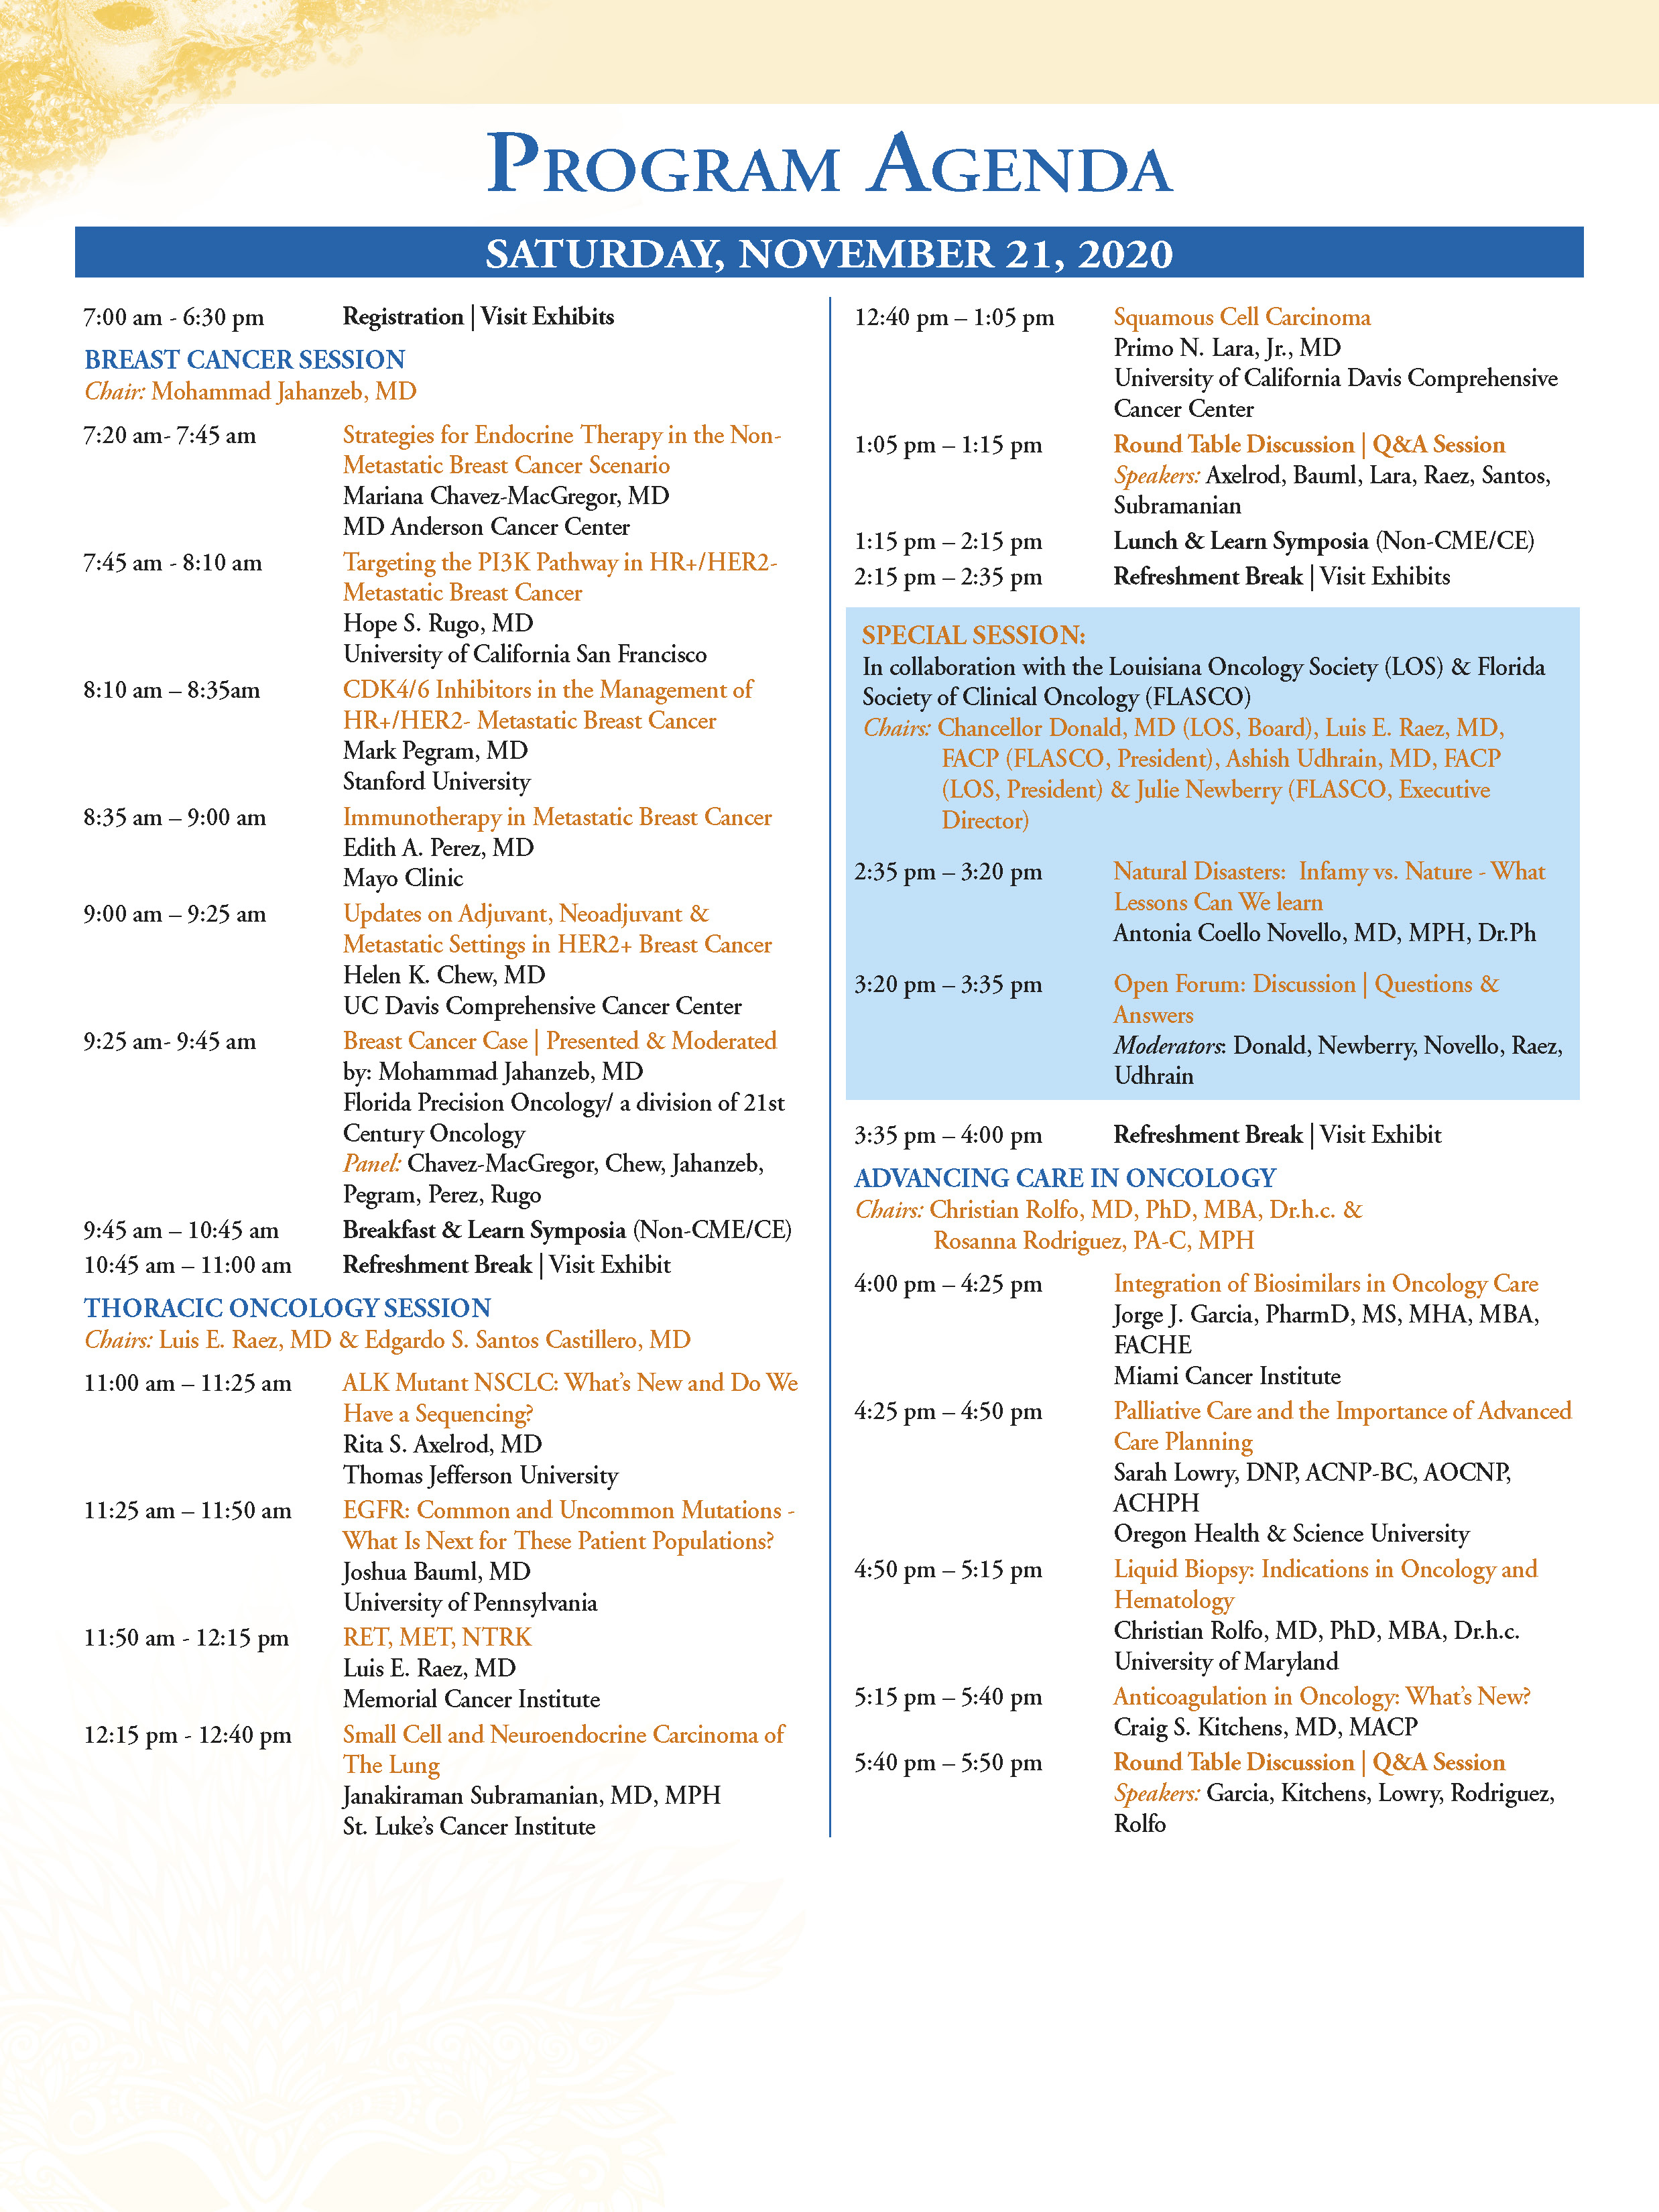 123434_NOLA 2020 Agenda Saturday